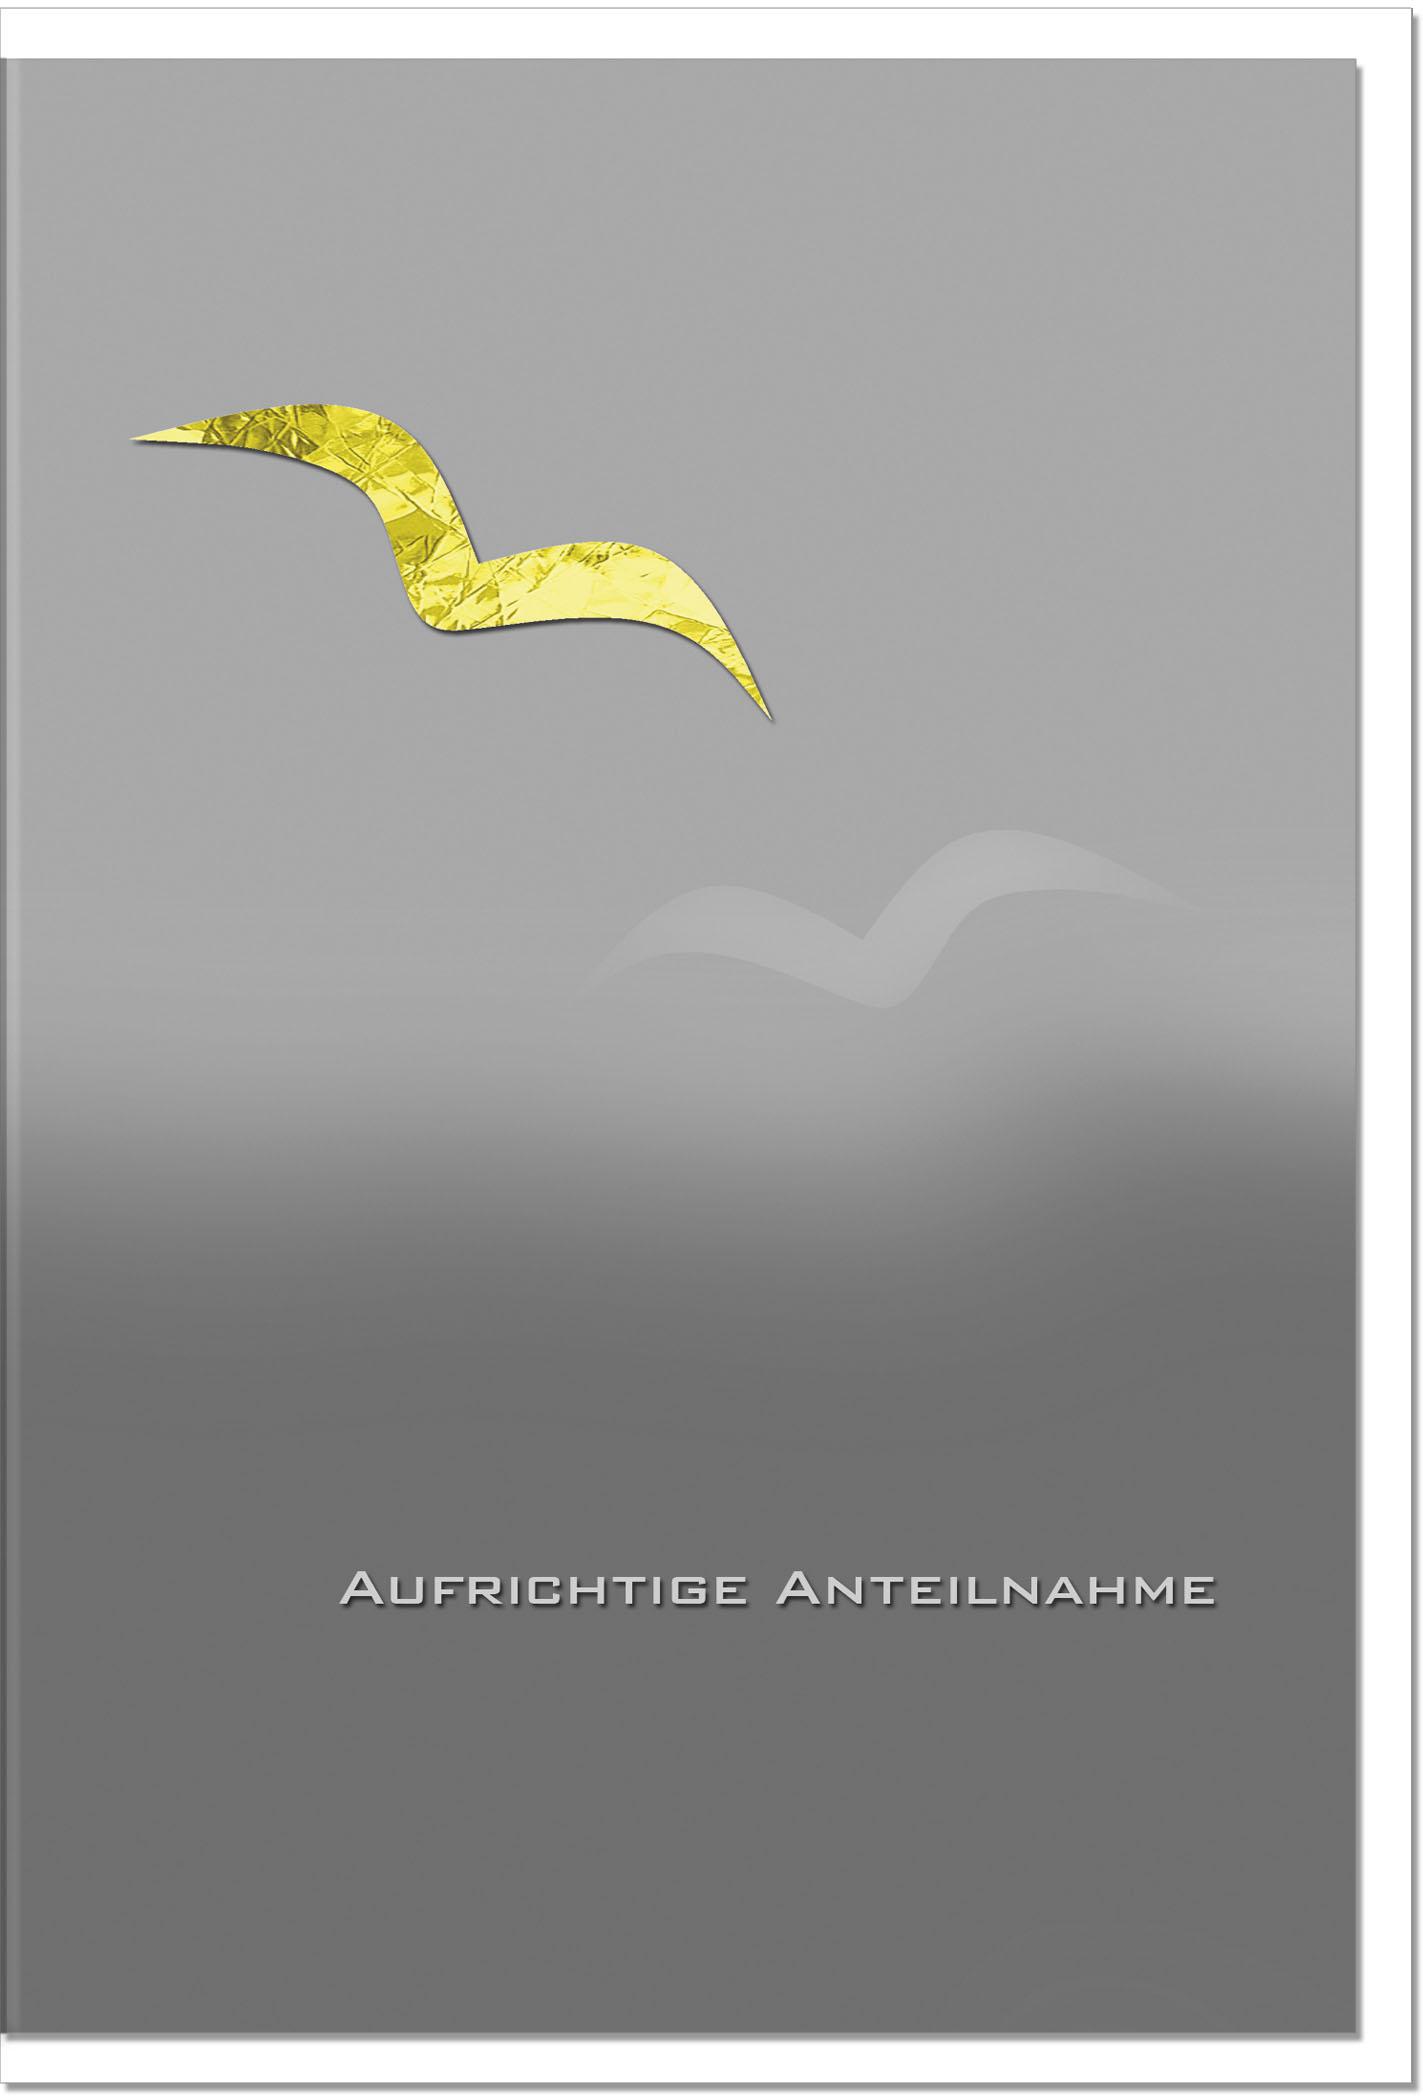 Trauerkarte Beileidskarte / Möwe